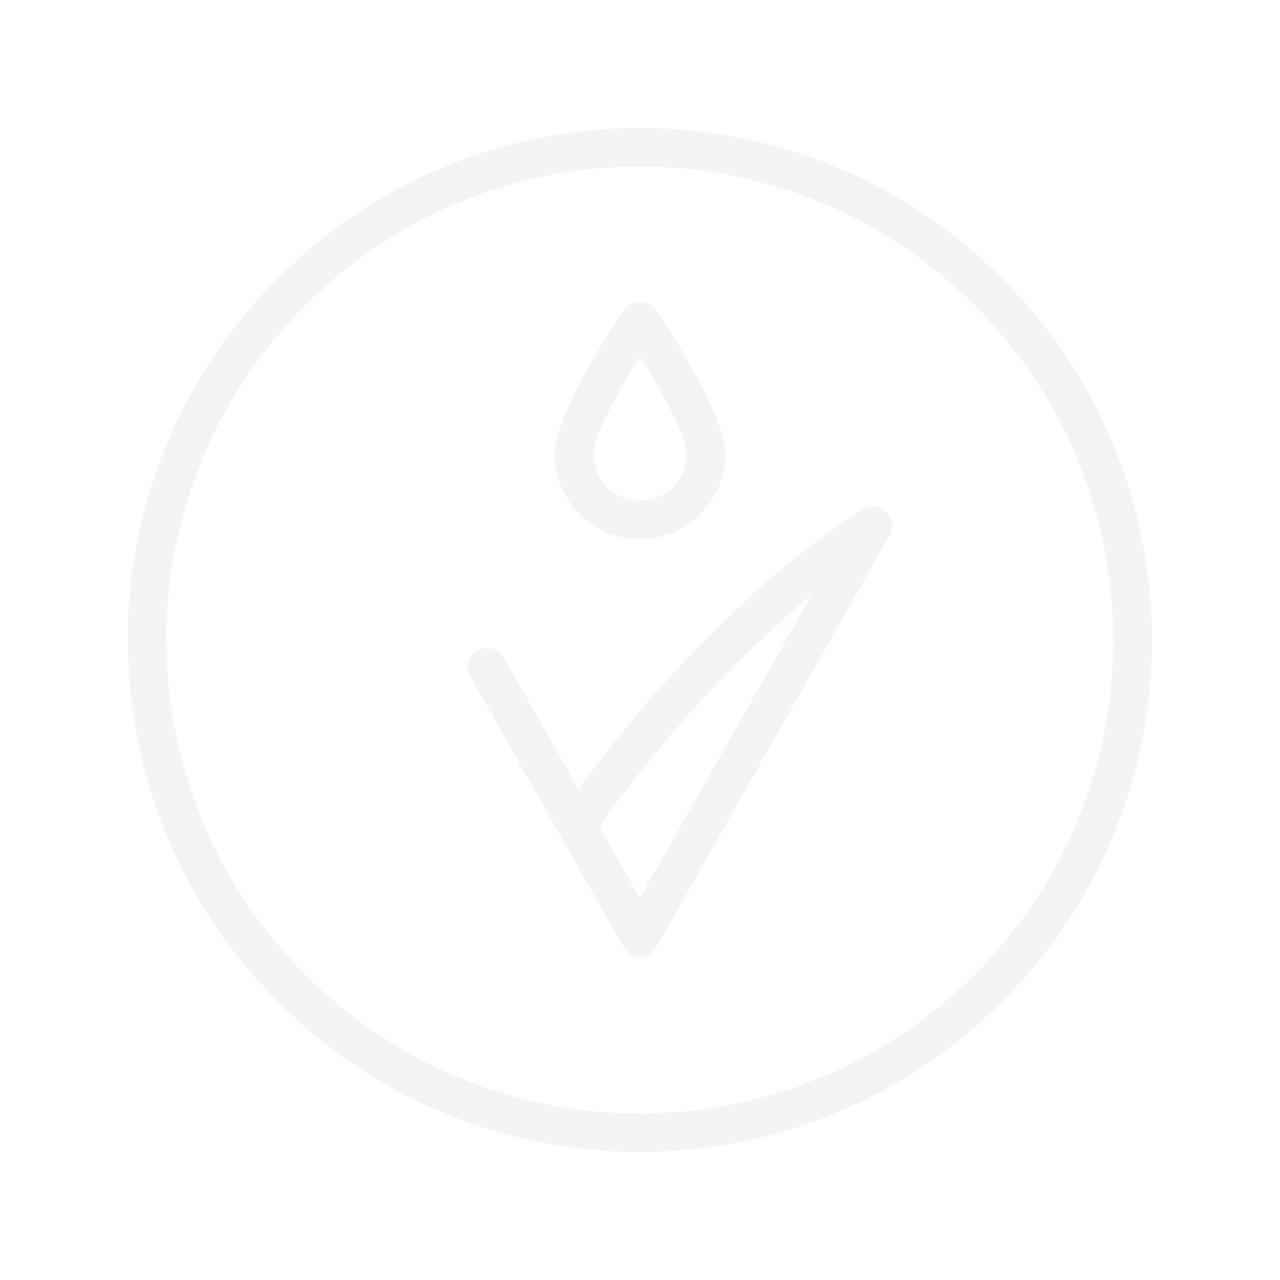 WELLA PROFESSIONALS Invigo Cool Blonde Color Refreshing Shampoo 1000ml